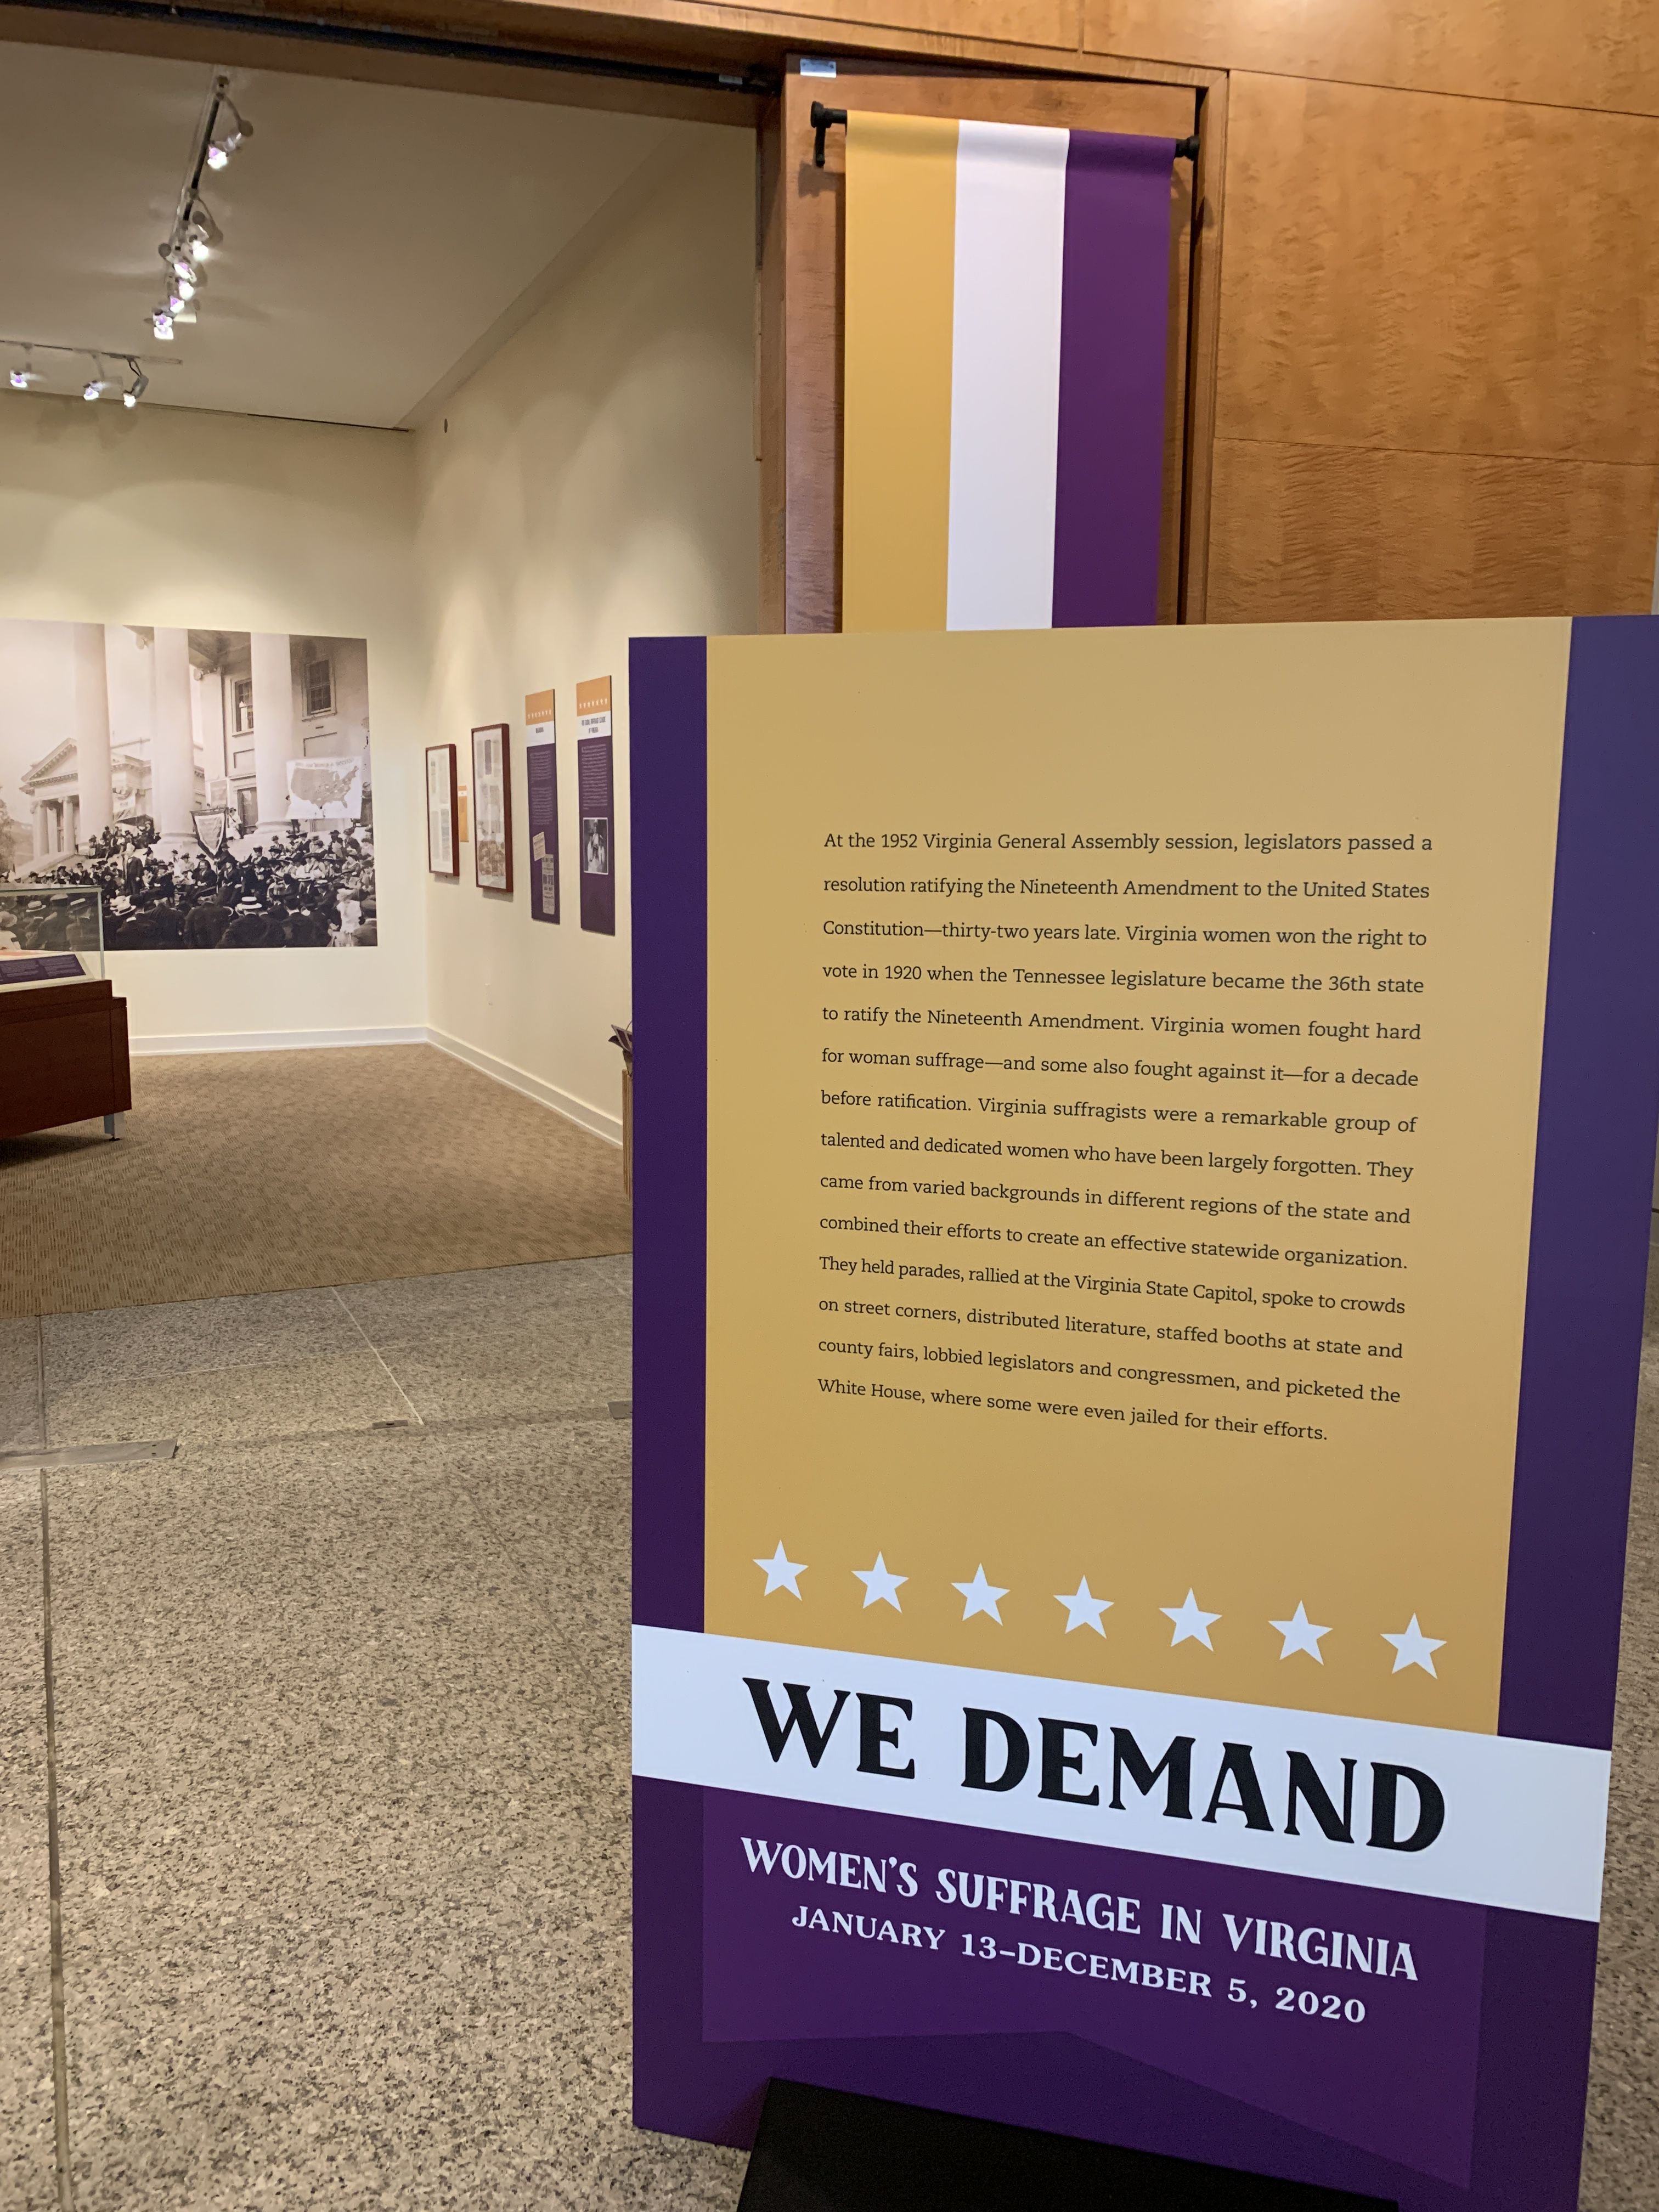 We Demand: Women's Suffrage in Virginia Exhibition